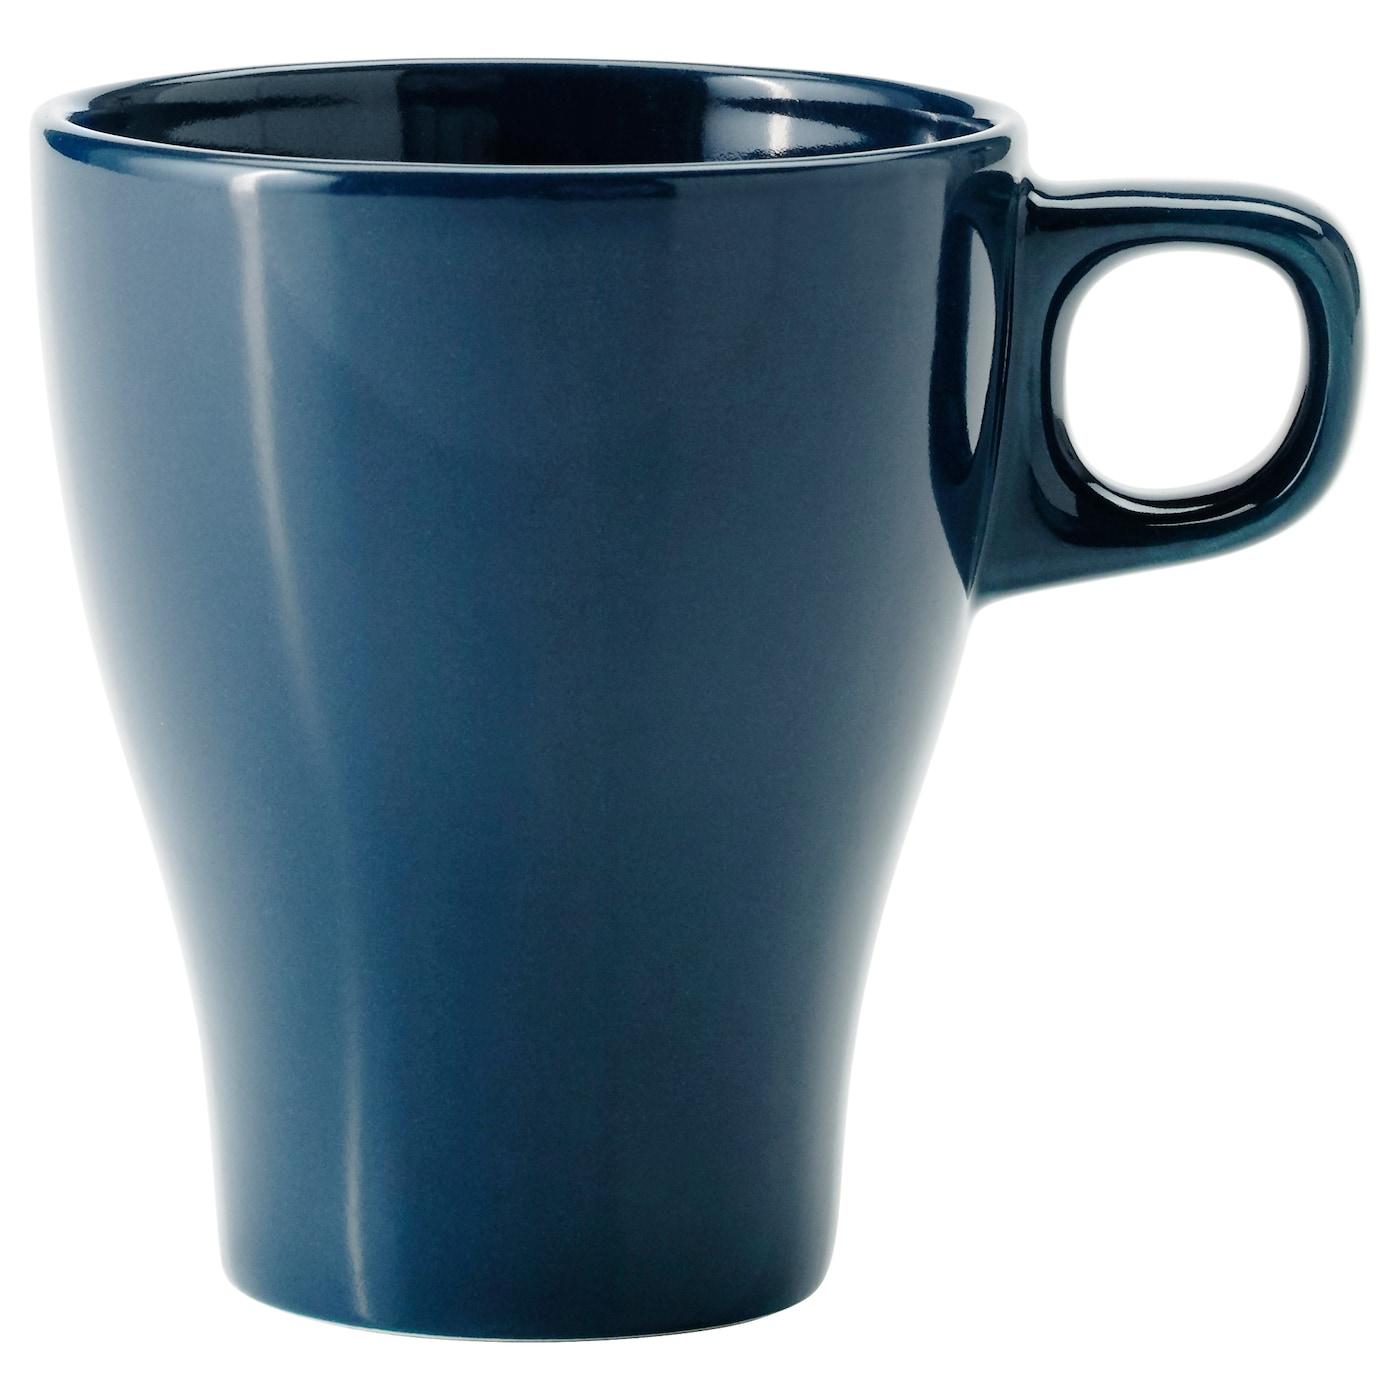 36cl porcelaine tasse de café tasse Ikea 365 Gobelet en blanc;